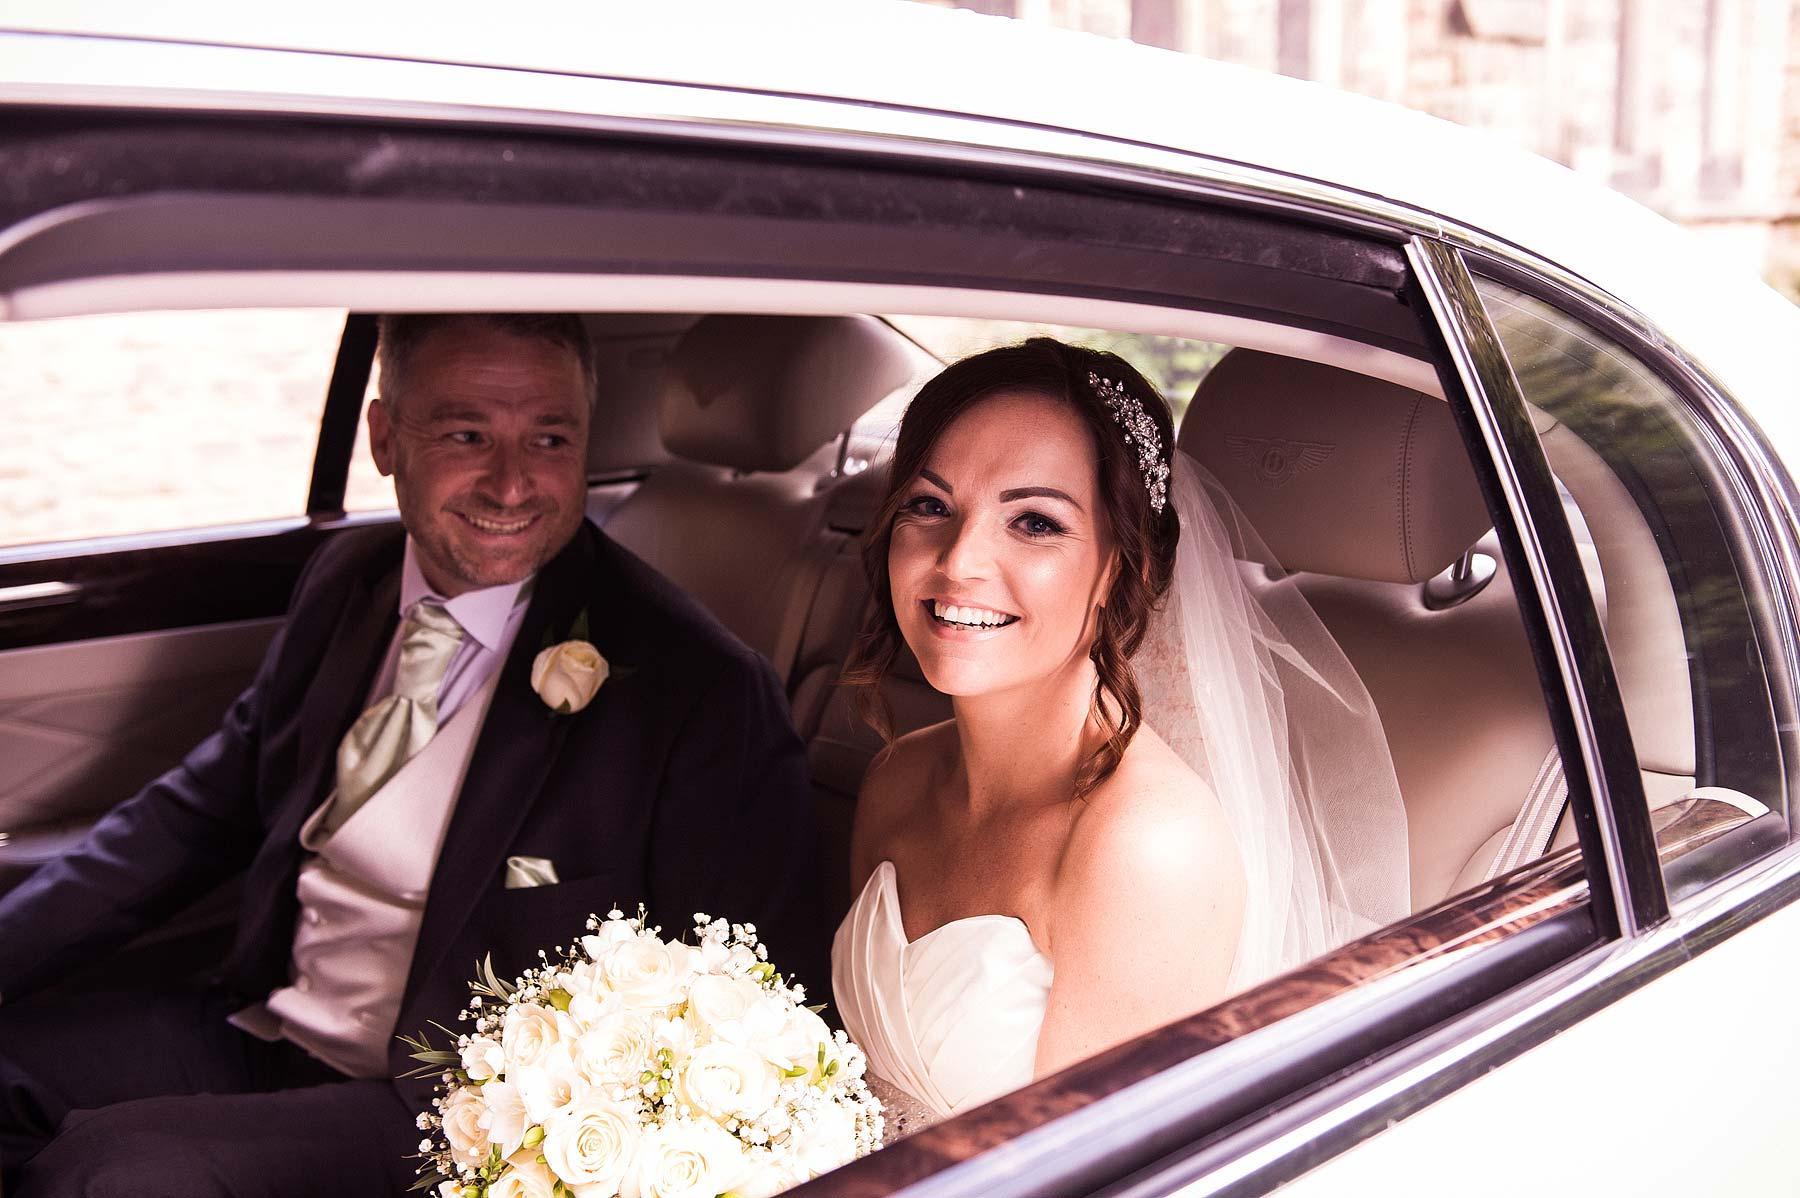 moat-house-church-wedding-photographs-012